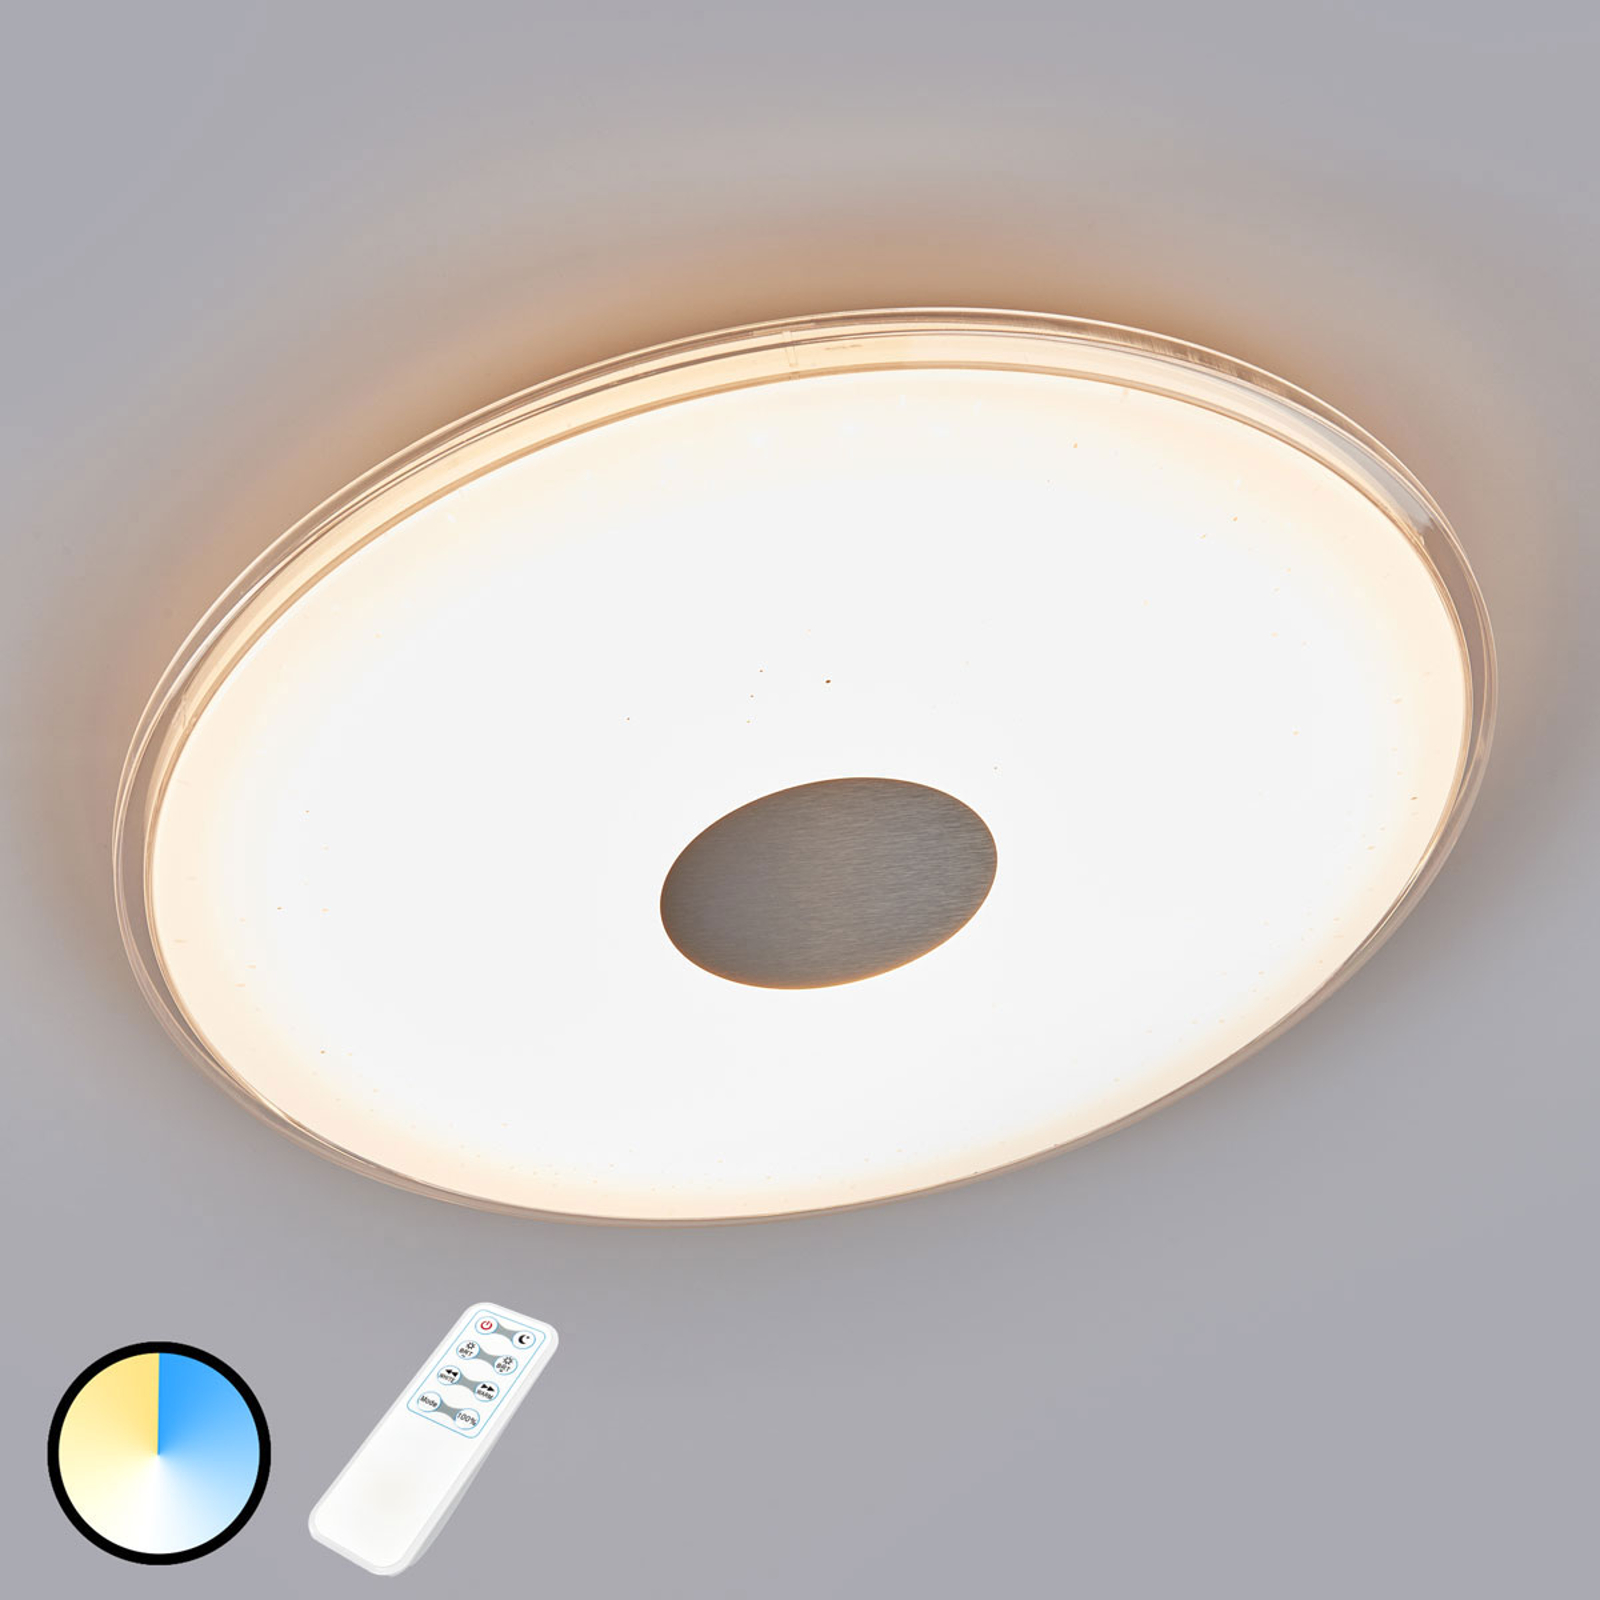 Plafonnier LED rond Shogun avec aspect scintillant